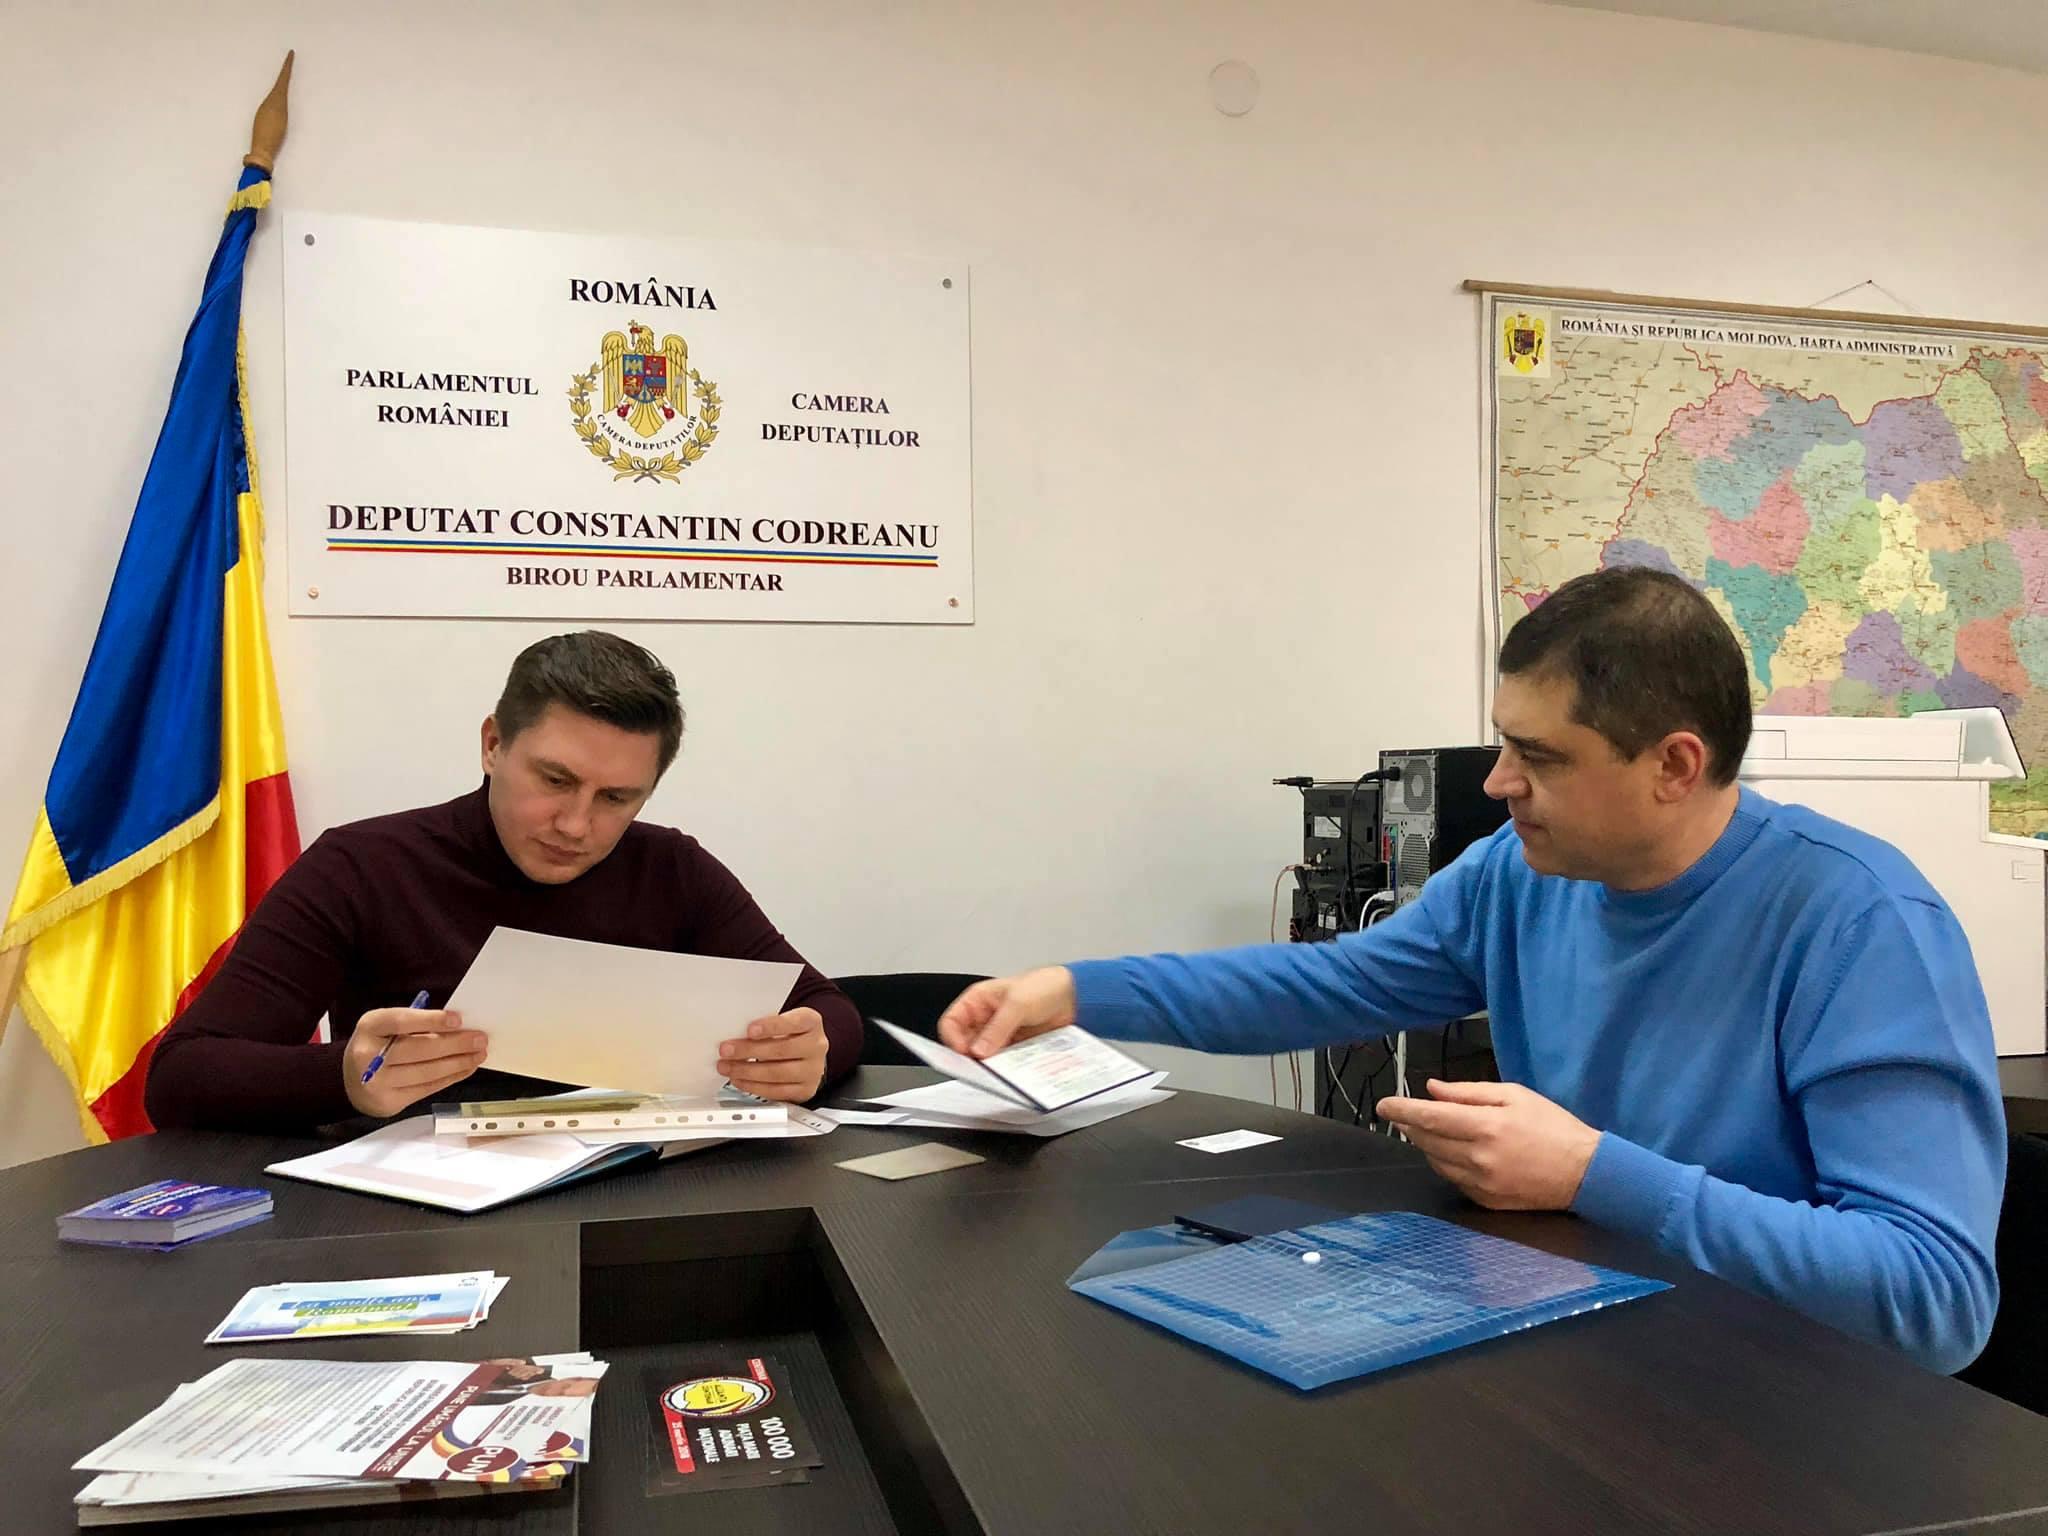 Birou Parlamentar Constantin Codreanu medici